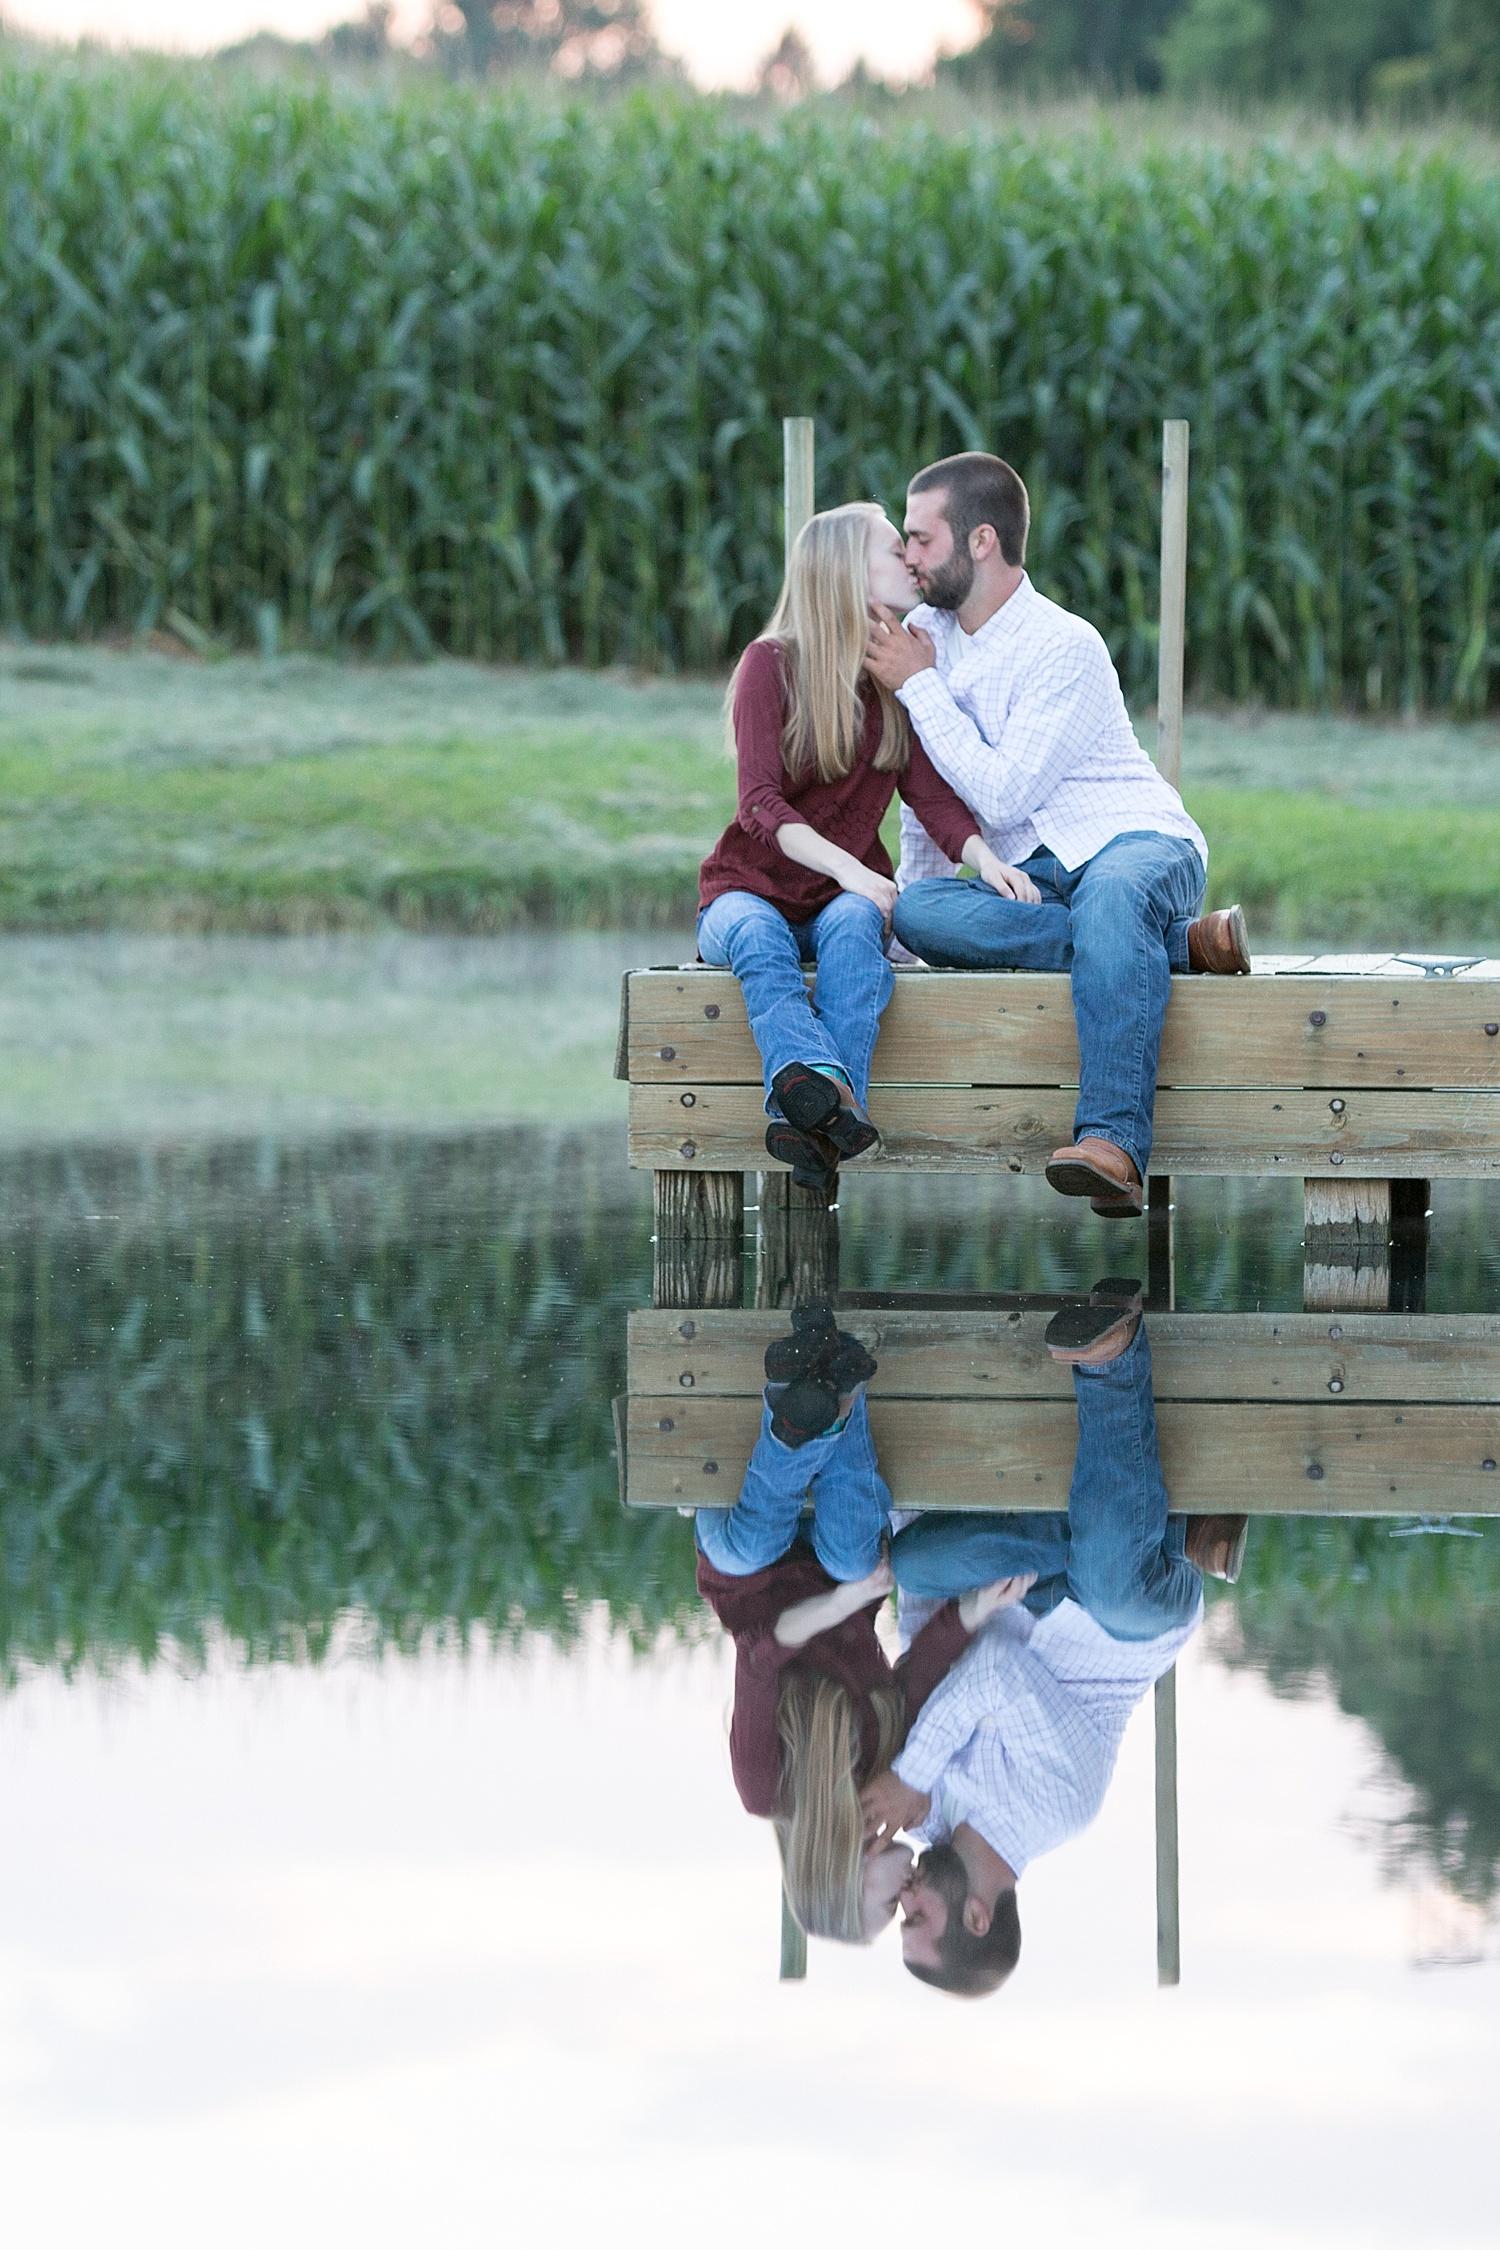 Romantic engagement session in sunflower field lancaster pa wedding photographer photo_0030.jpg